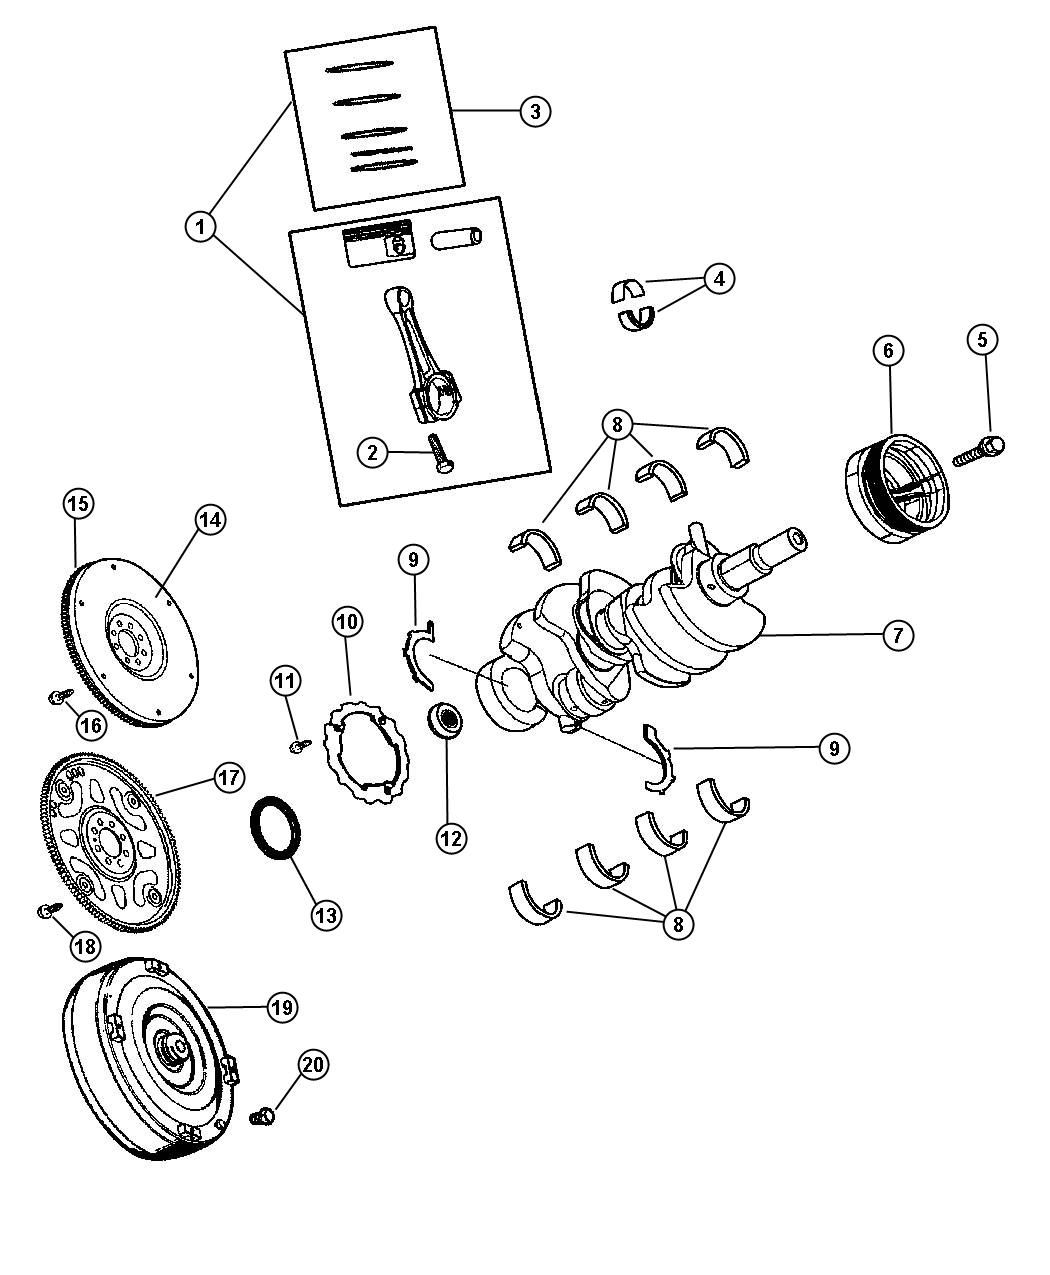 Dodge Dakota Bolt. Connecting rod. Mounting. Connecting